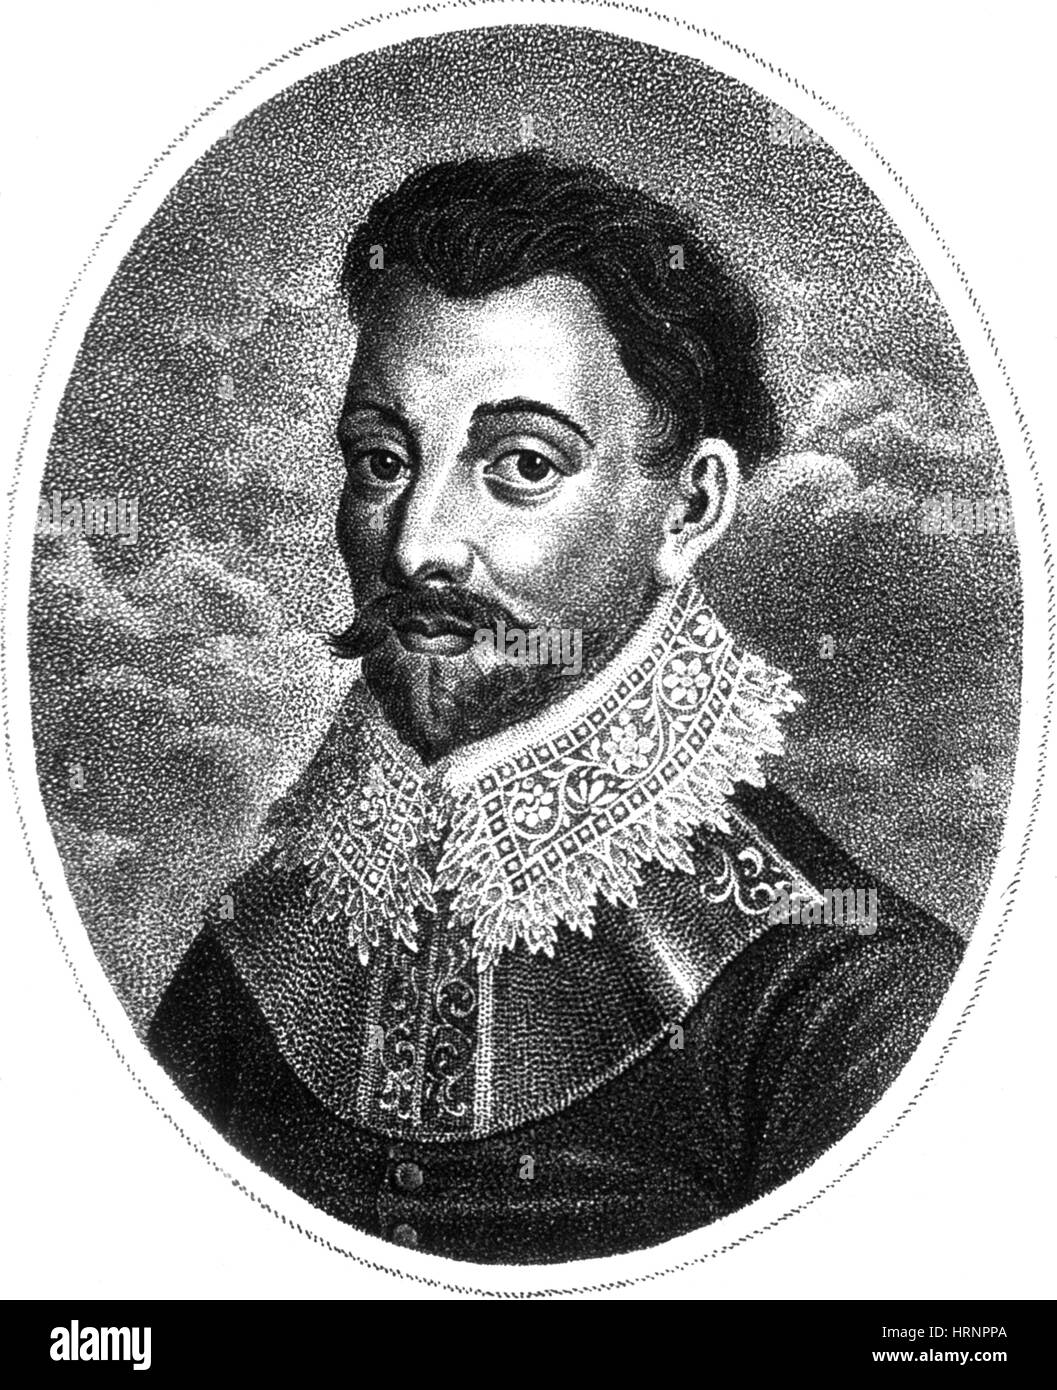 Francis Drake, English Explorer - Stock Image